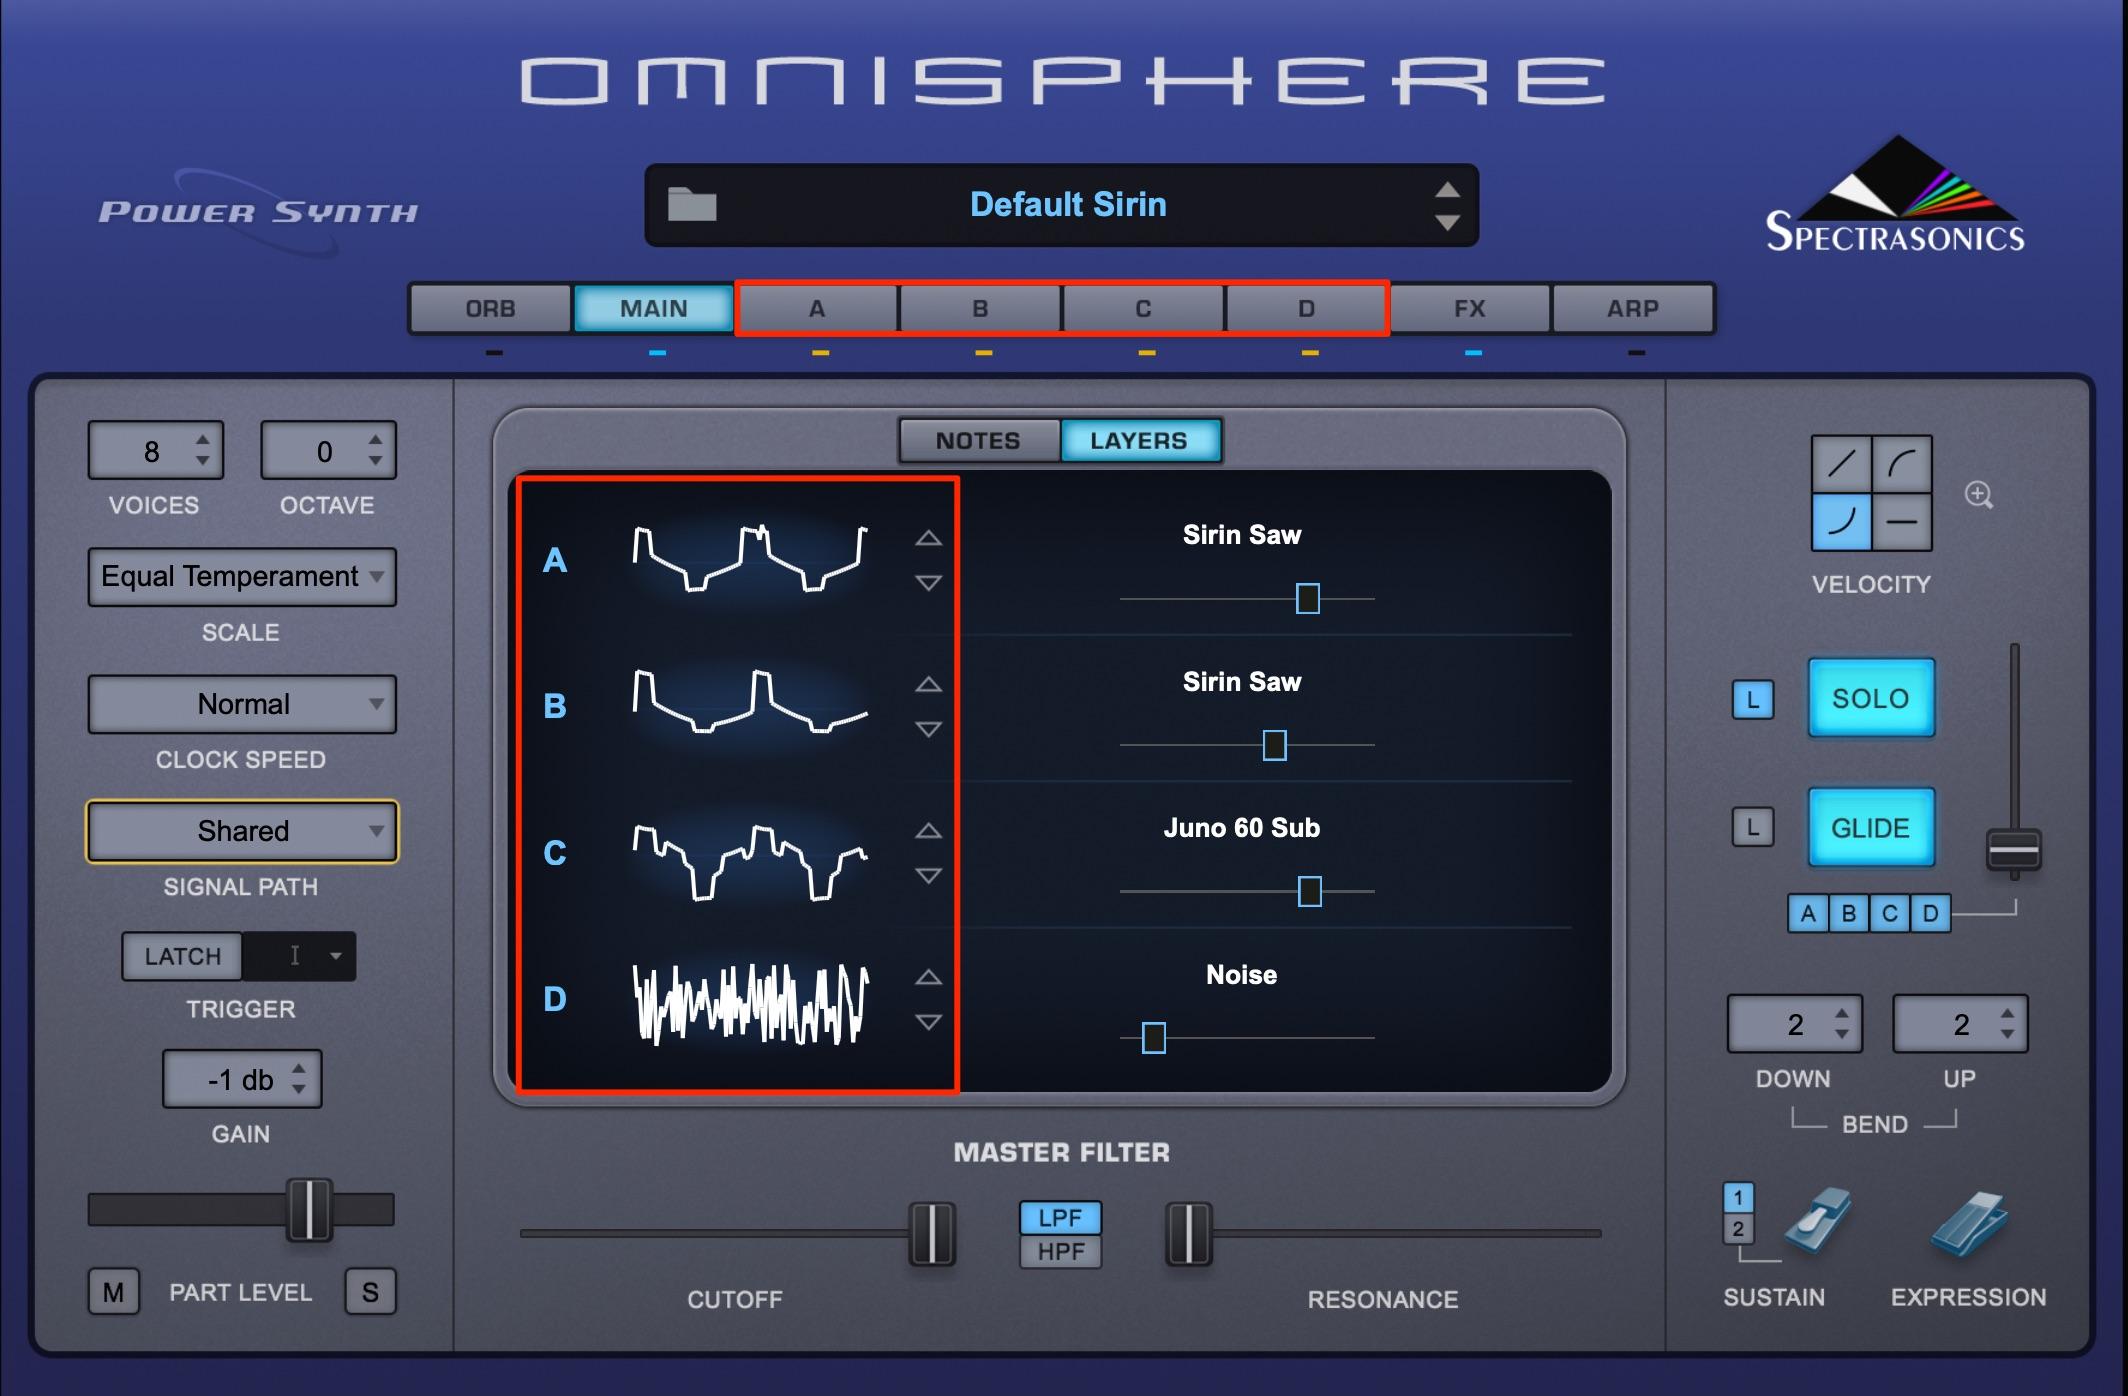 Omnisphere_サウンドレイヤー